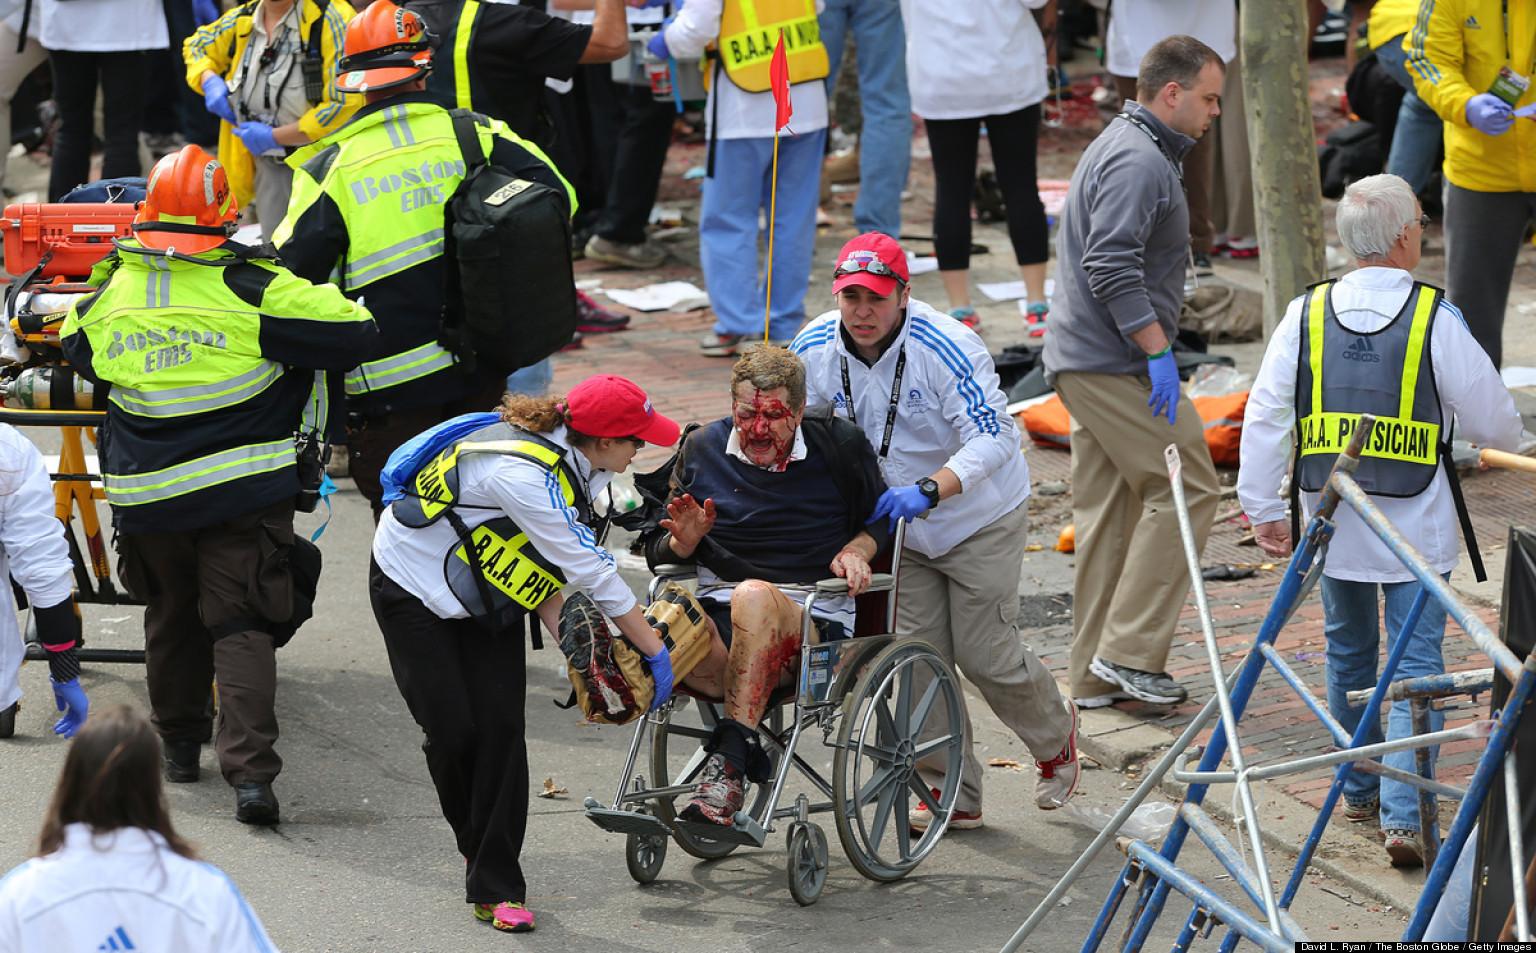 Boston Marathon Bombing (GRAPHIC PHOTOS)